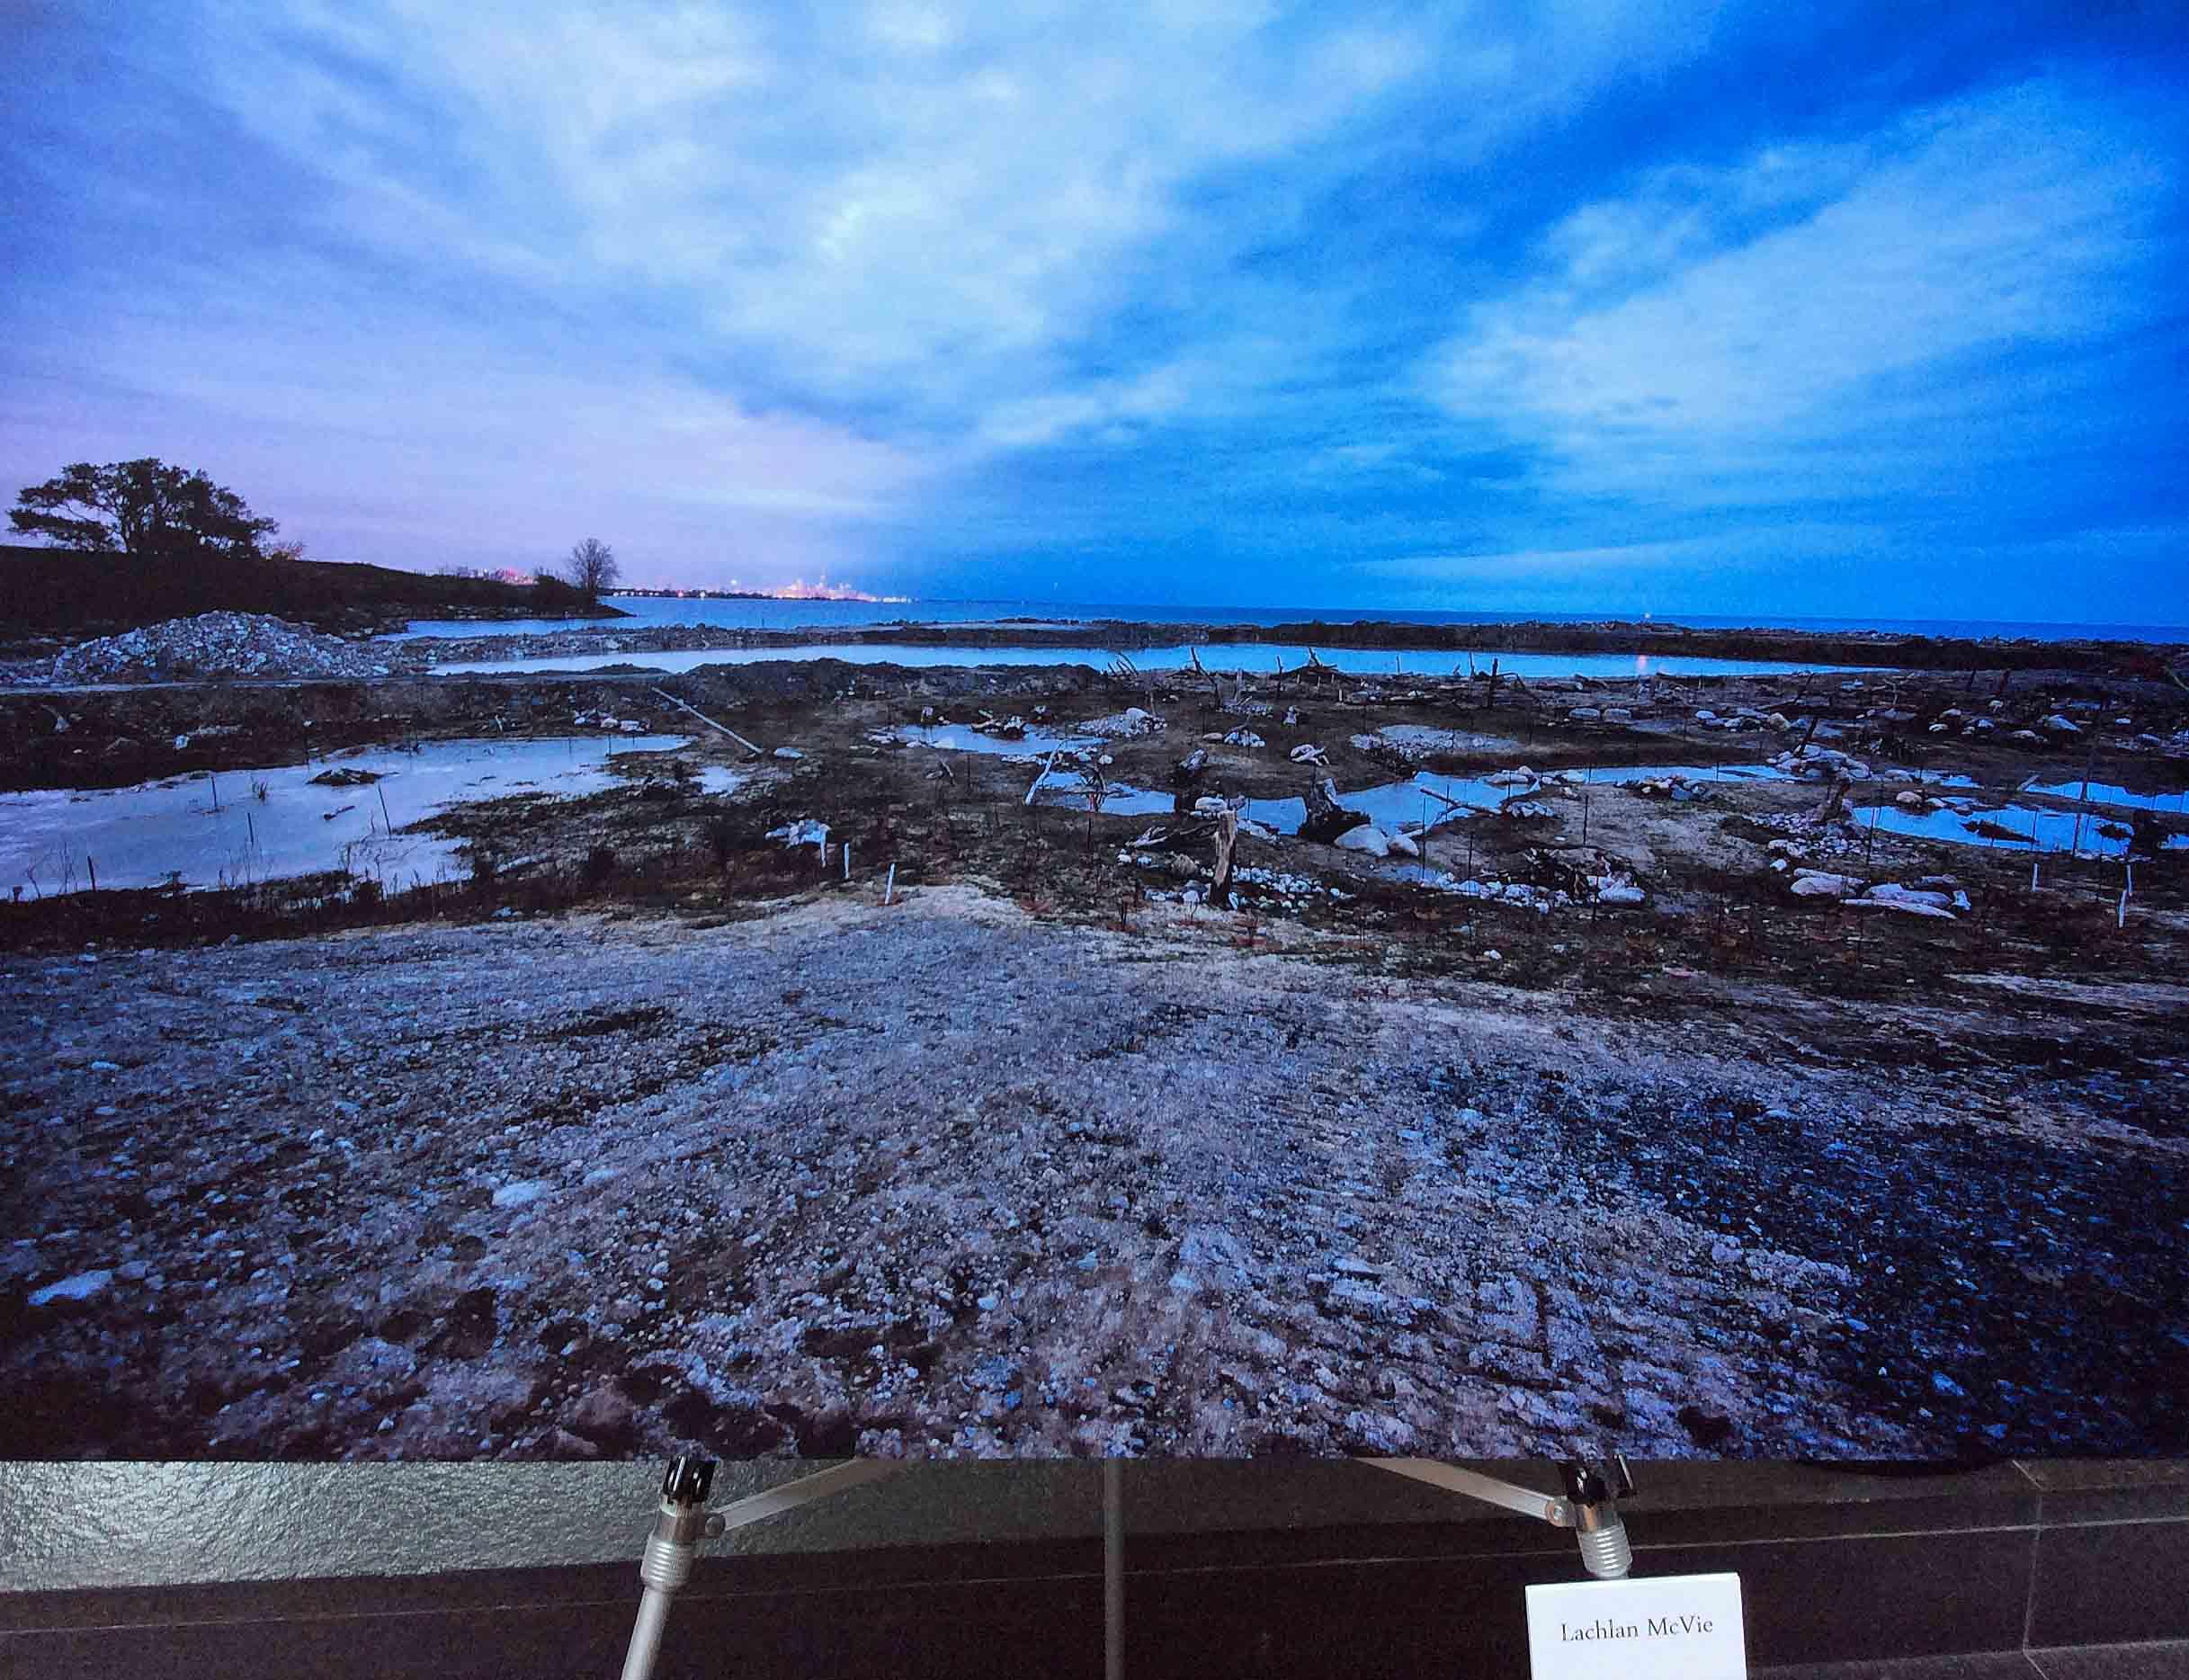 """Water Is…"" Appears in Morphology Exhibit at In Situ Multi Arts Festival 2018"